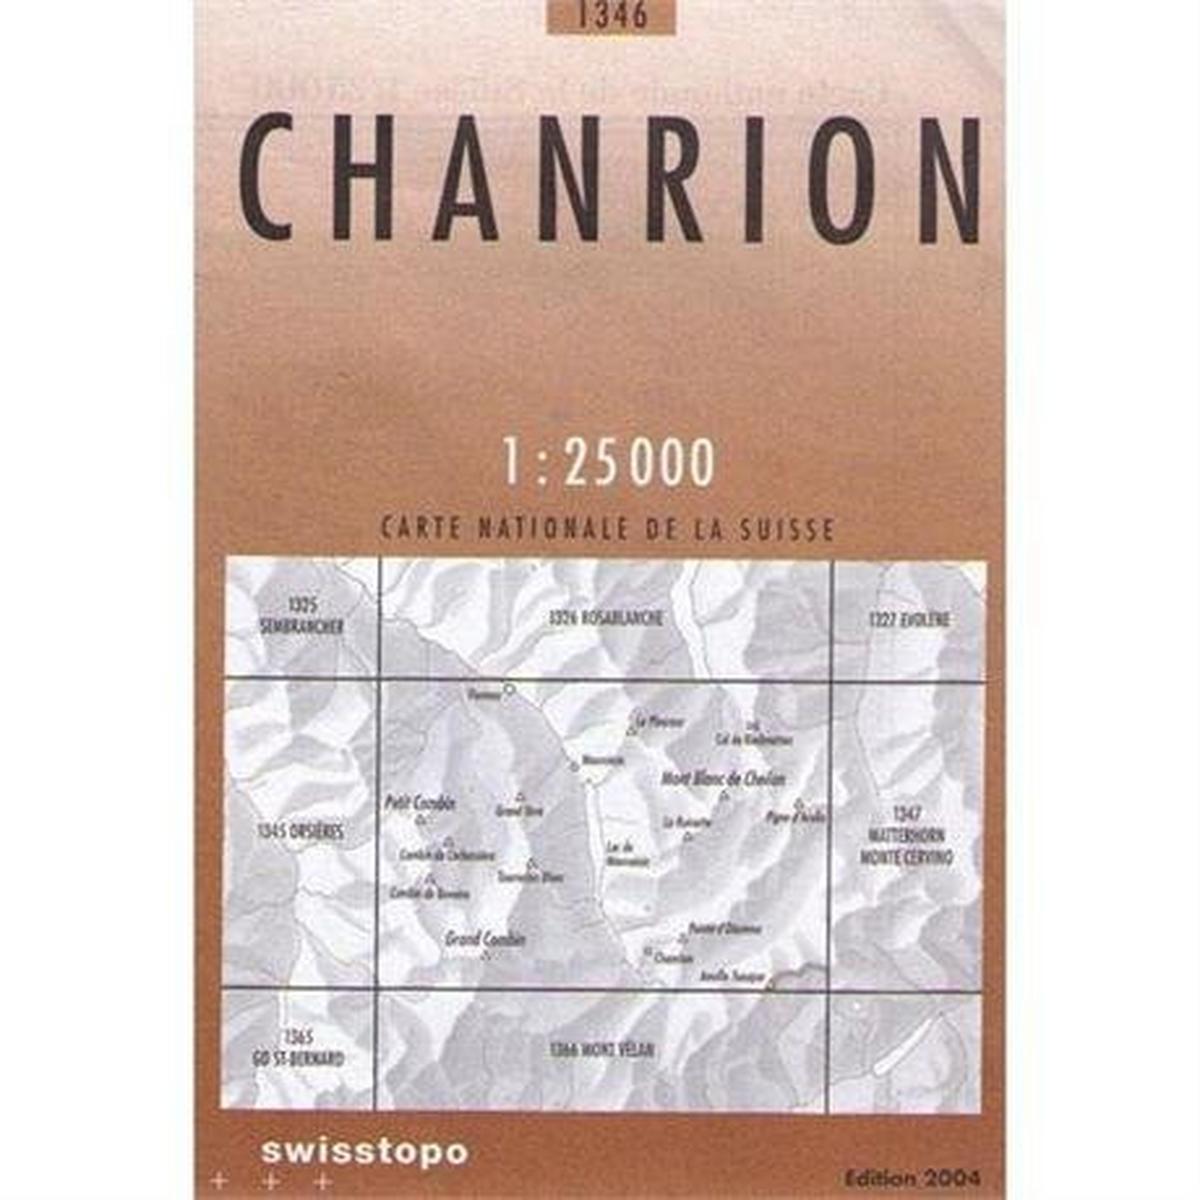 Miscellaneous Switzerland Map 1346 Chanrion